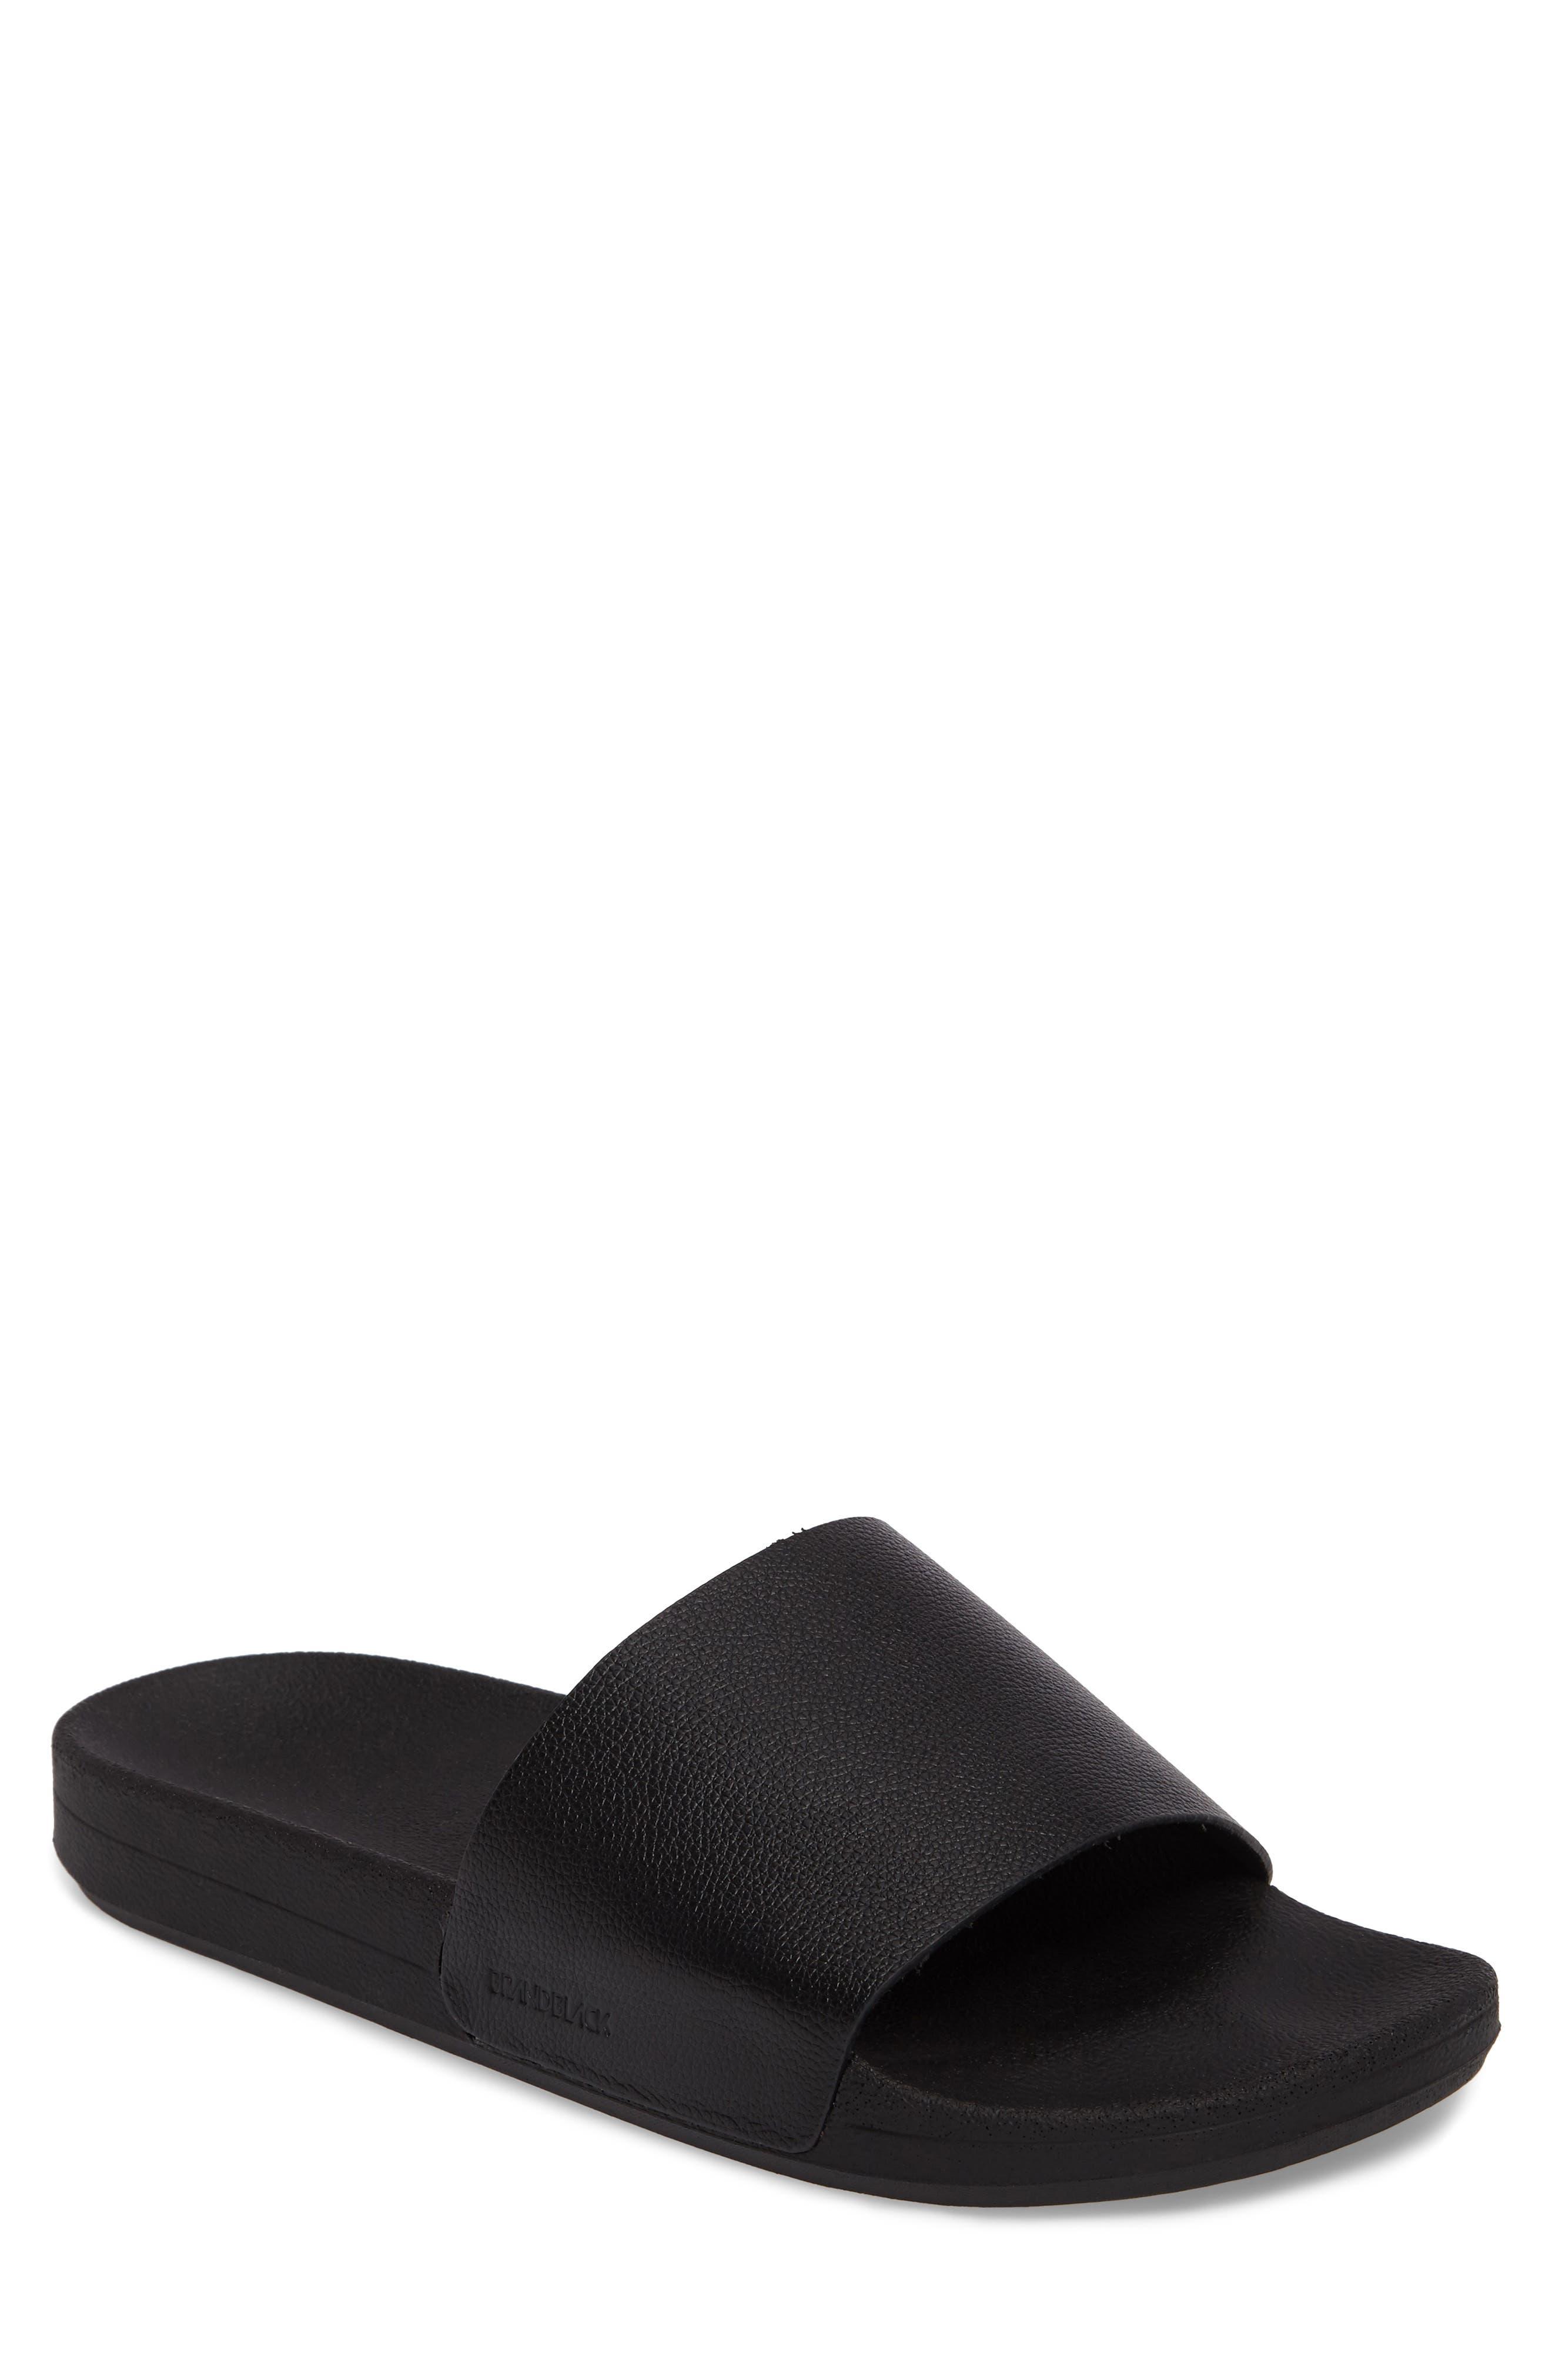 Kashiba Slide Sandal,                         Main,                         color, 017